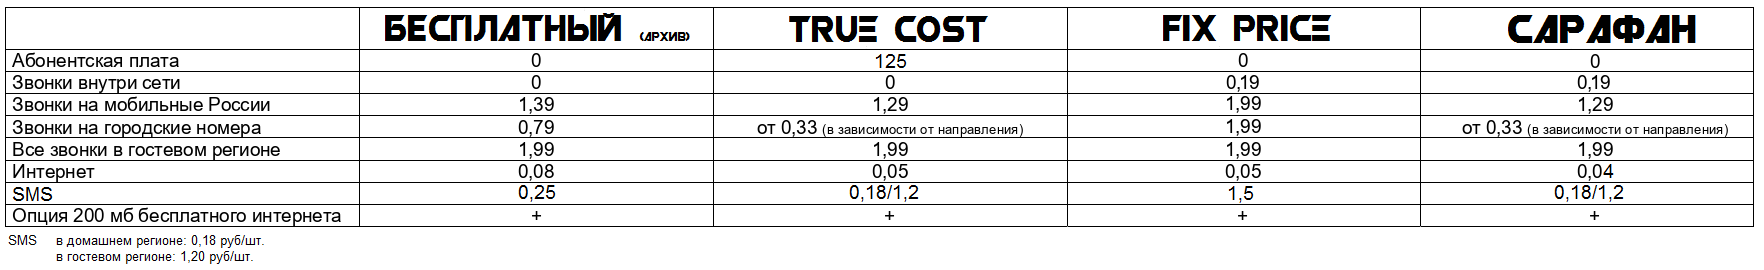 "MCN Telecom запускает новый тариф ""Сарафан"" 2"